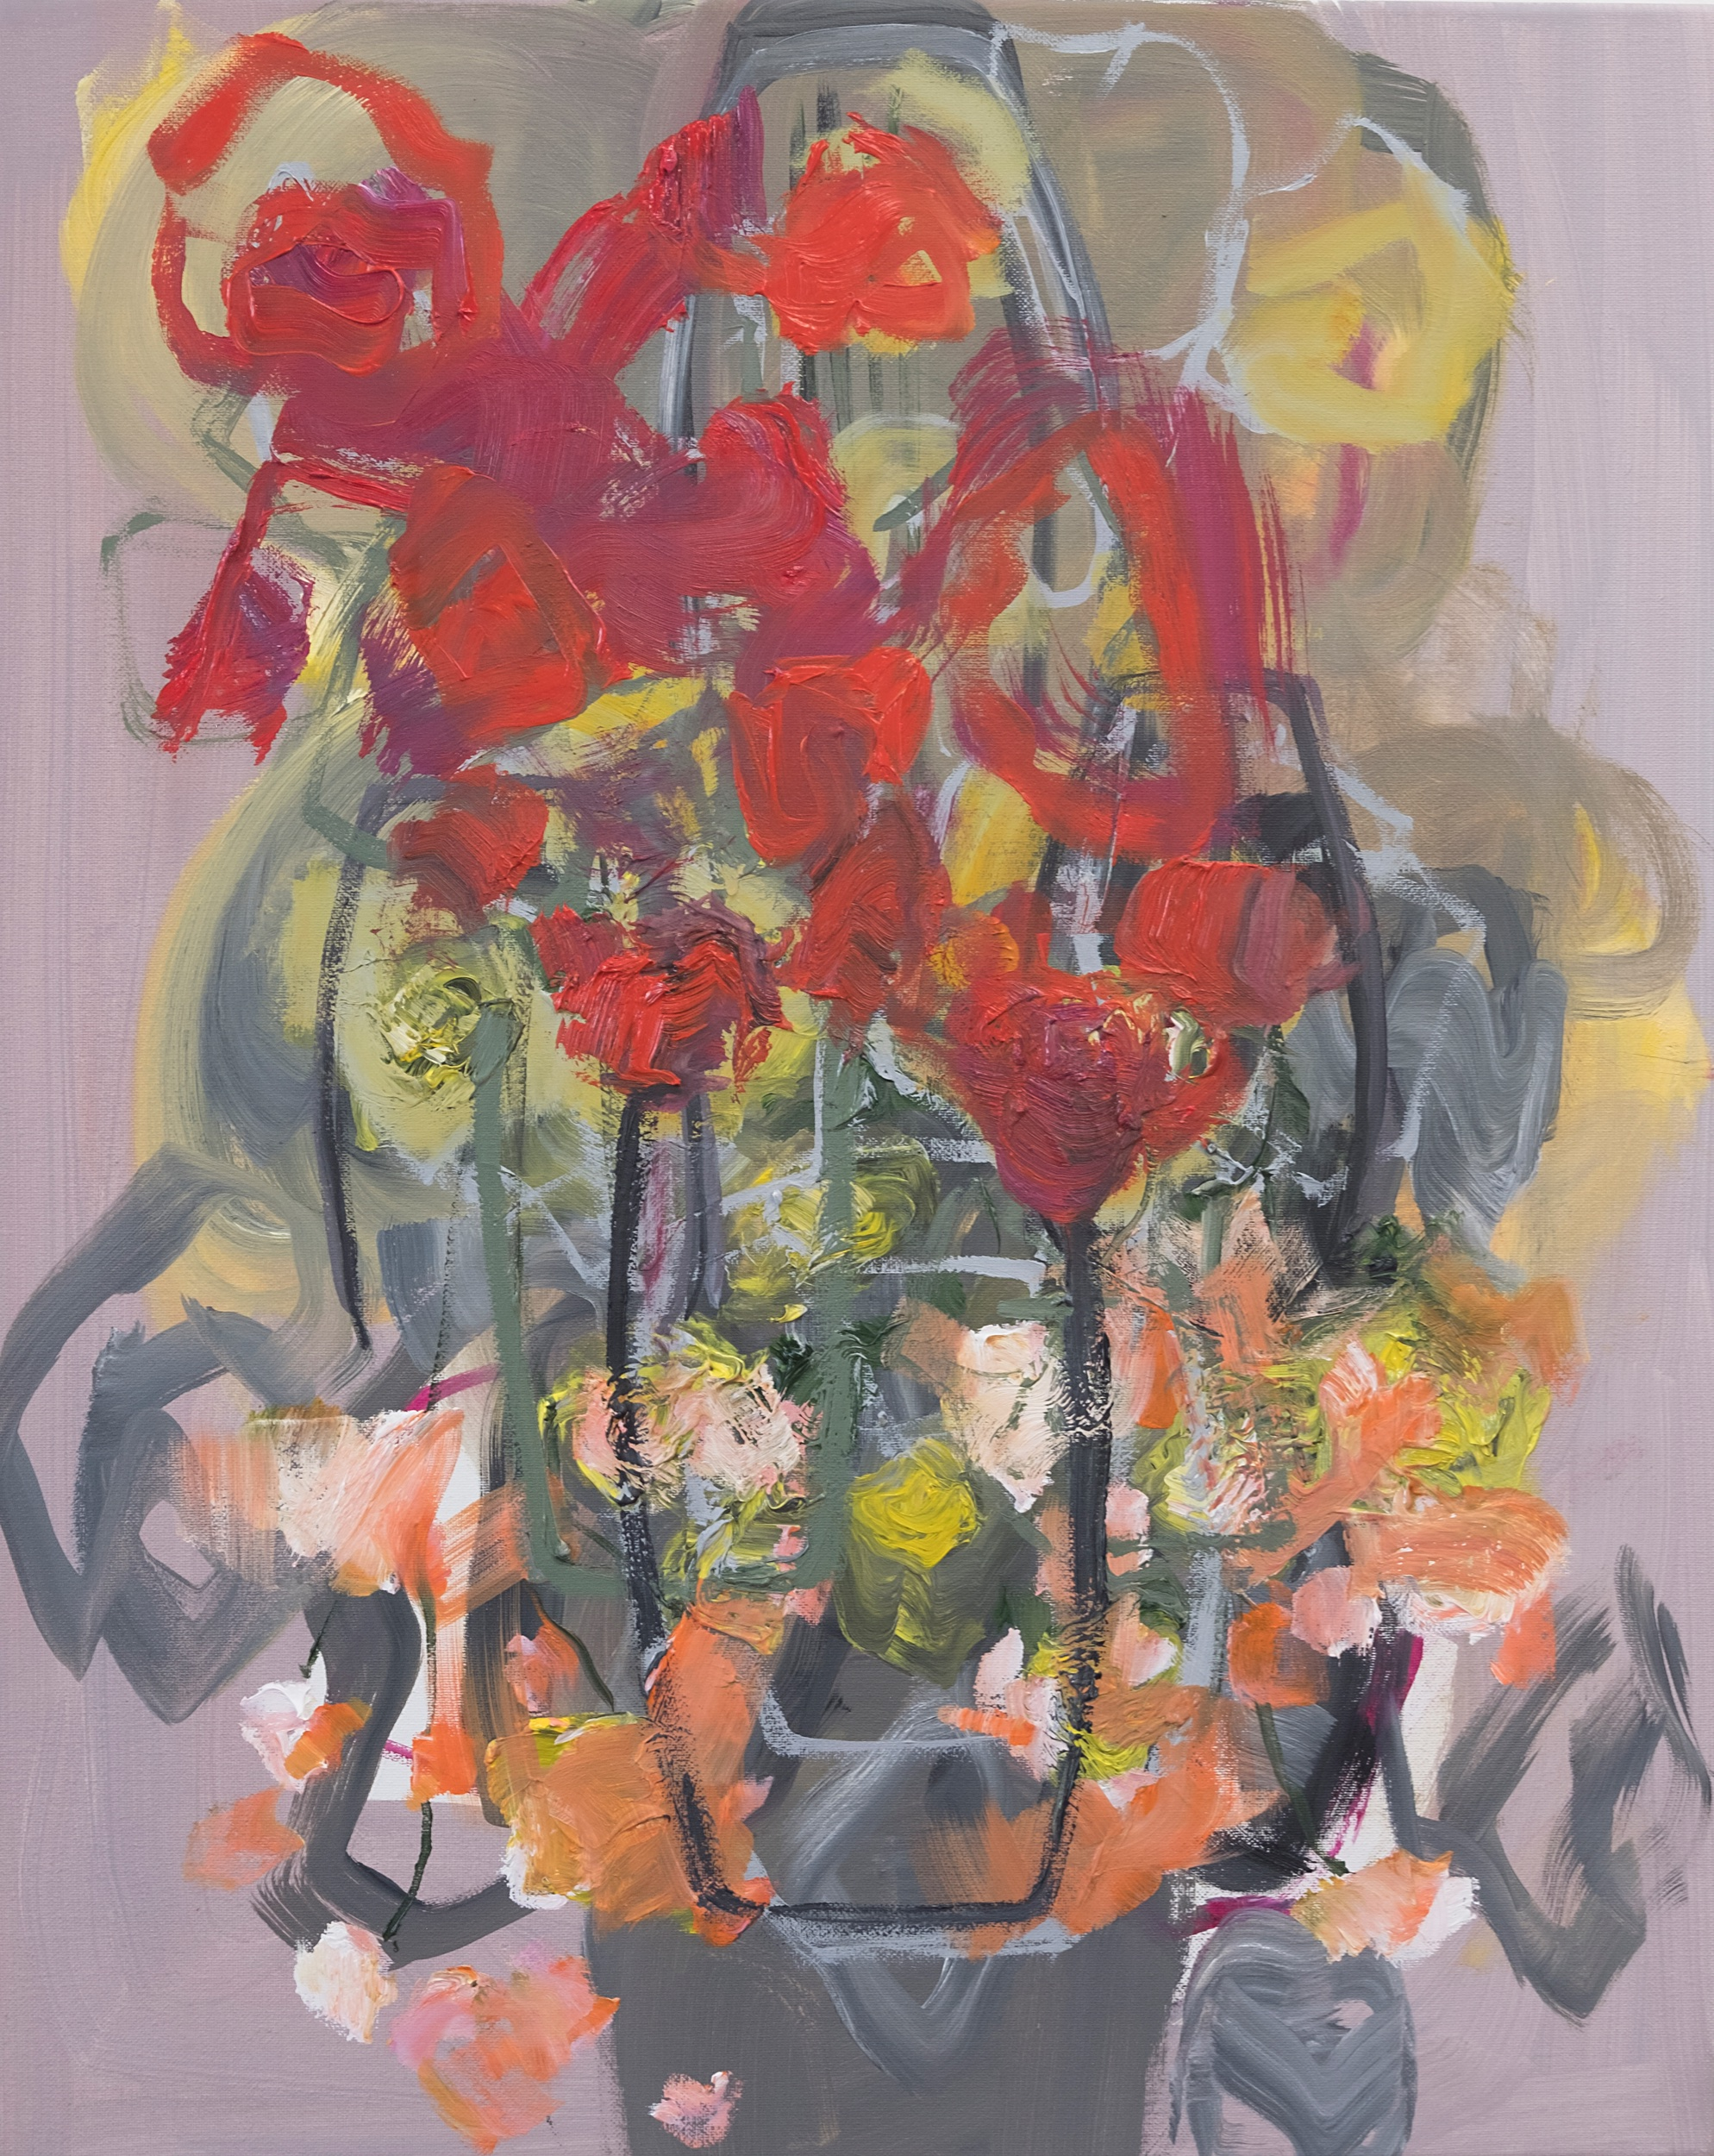 Teetering, 2019. Oil on canvas, 50 x 40 cm.